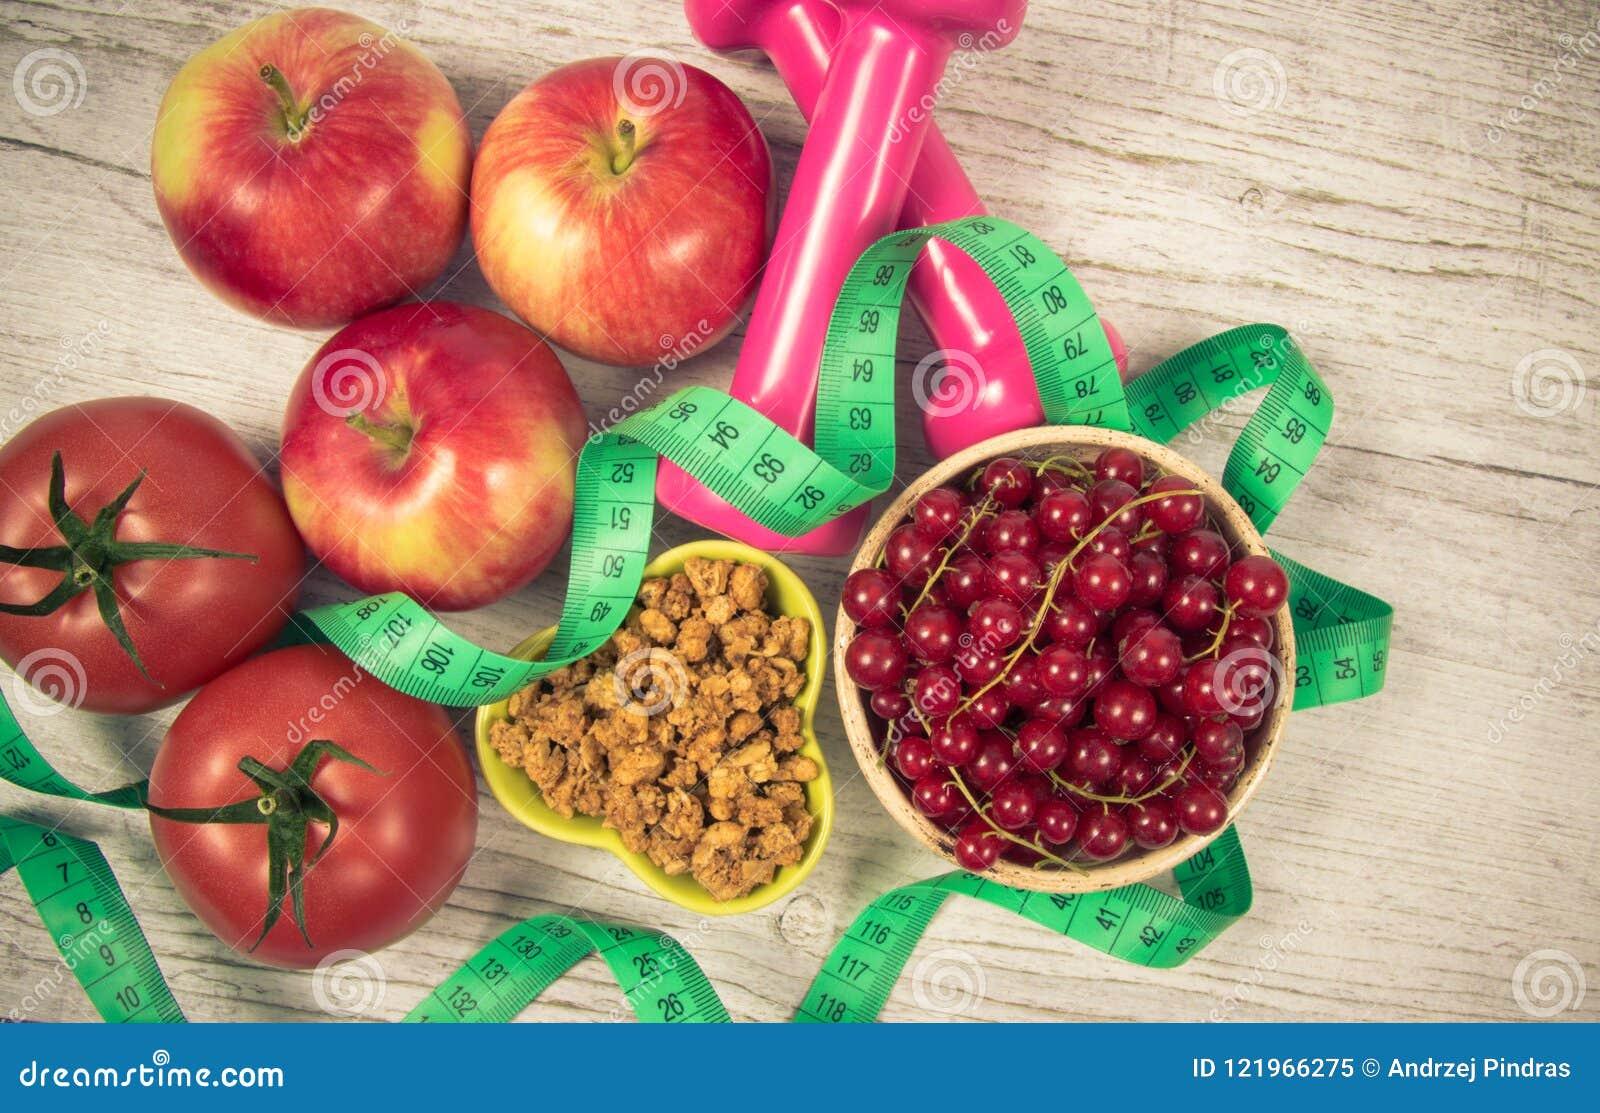 Proper nutrition: avs diet